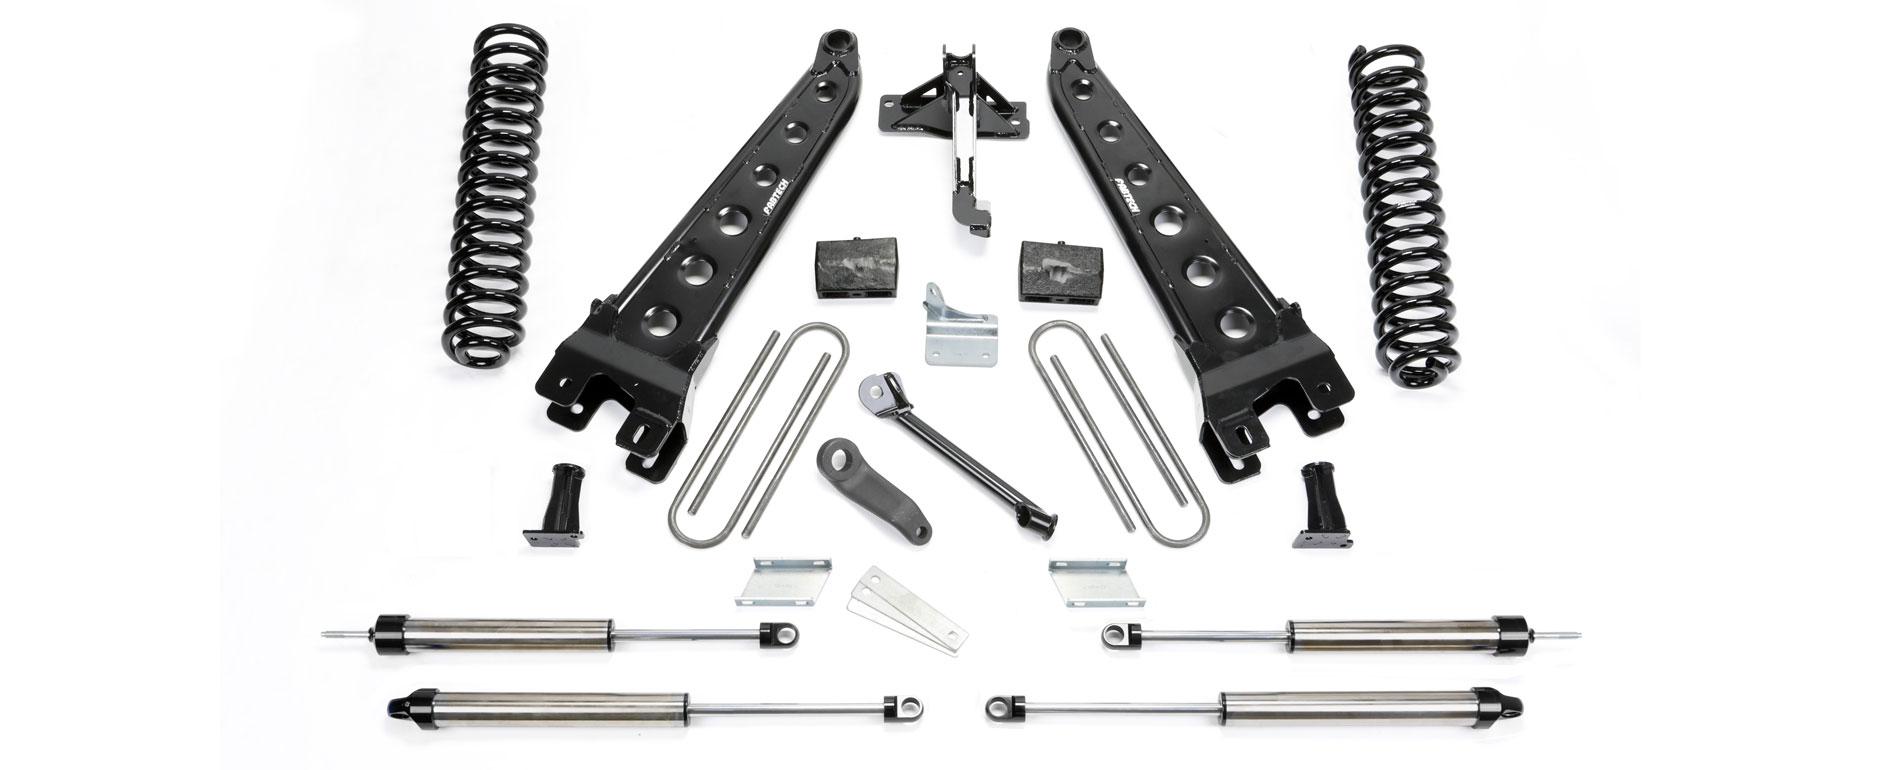 F 450 F 550 Fabtech Lift Kits